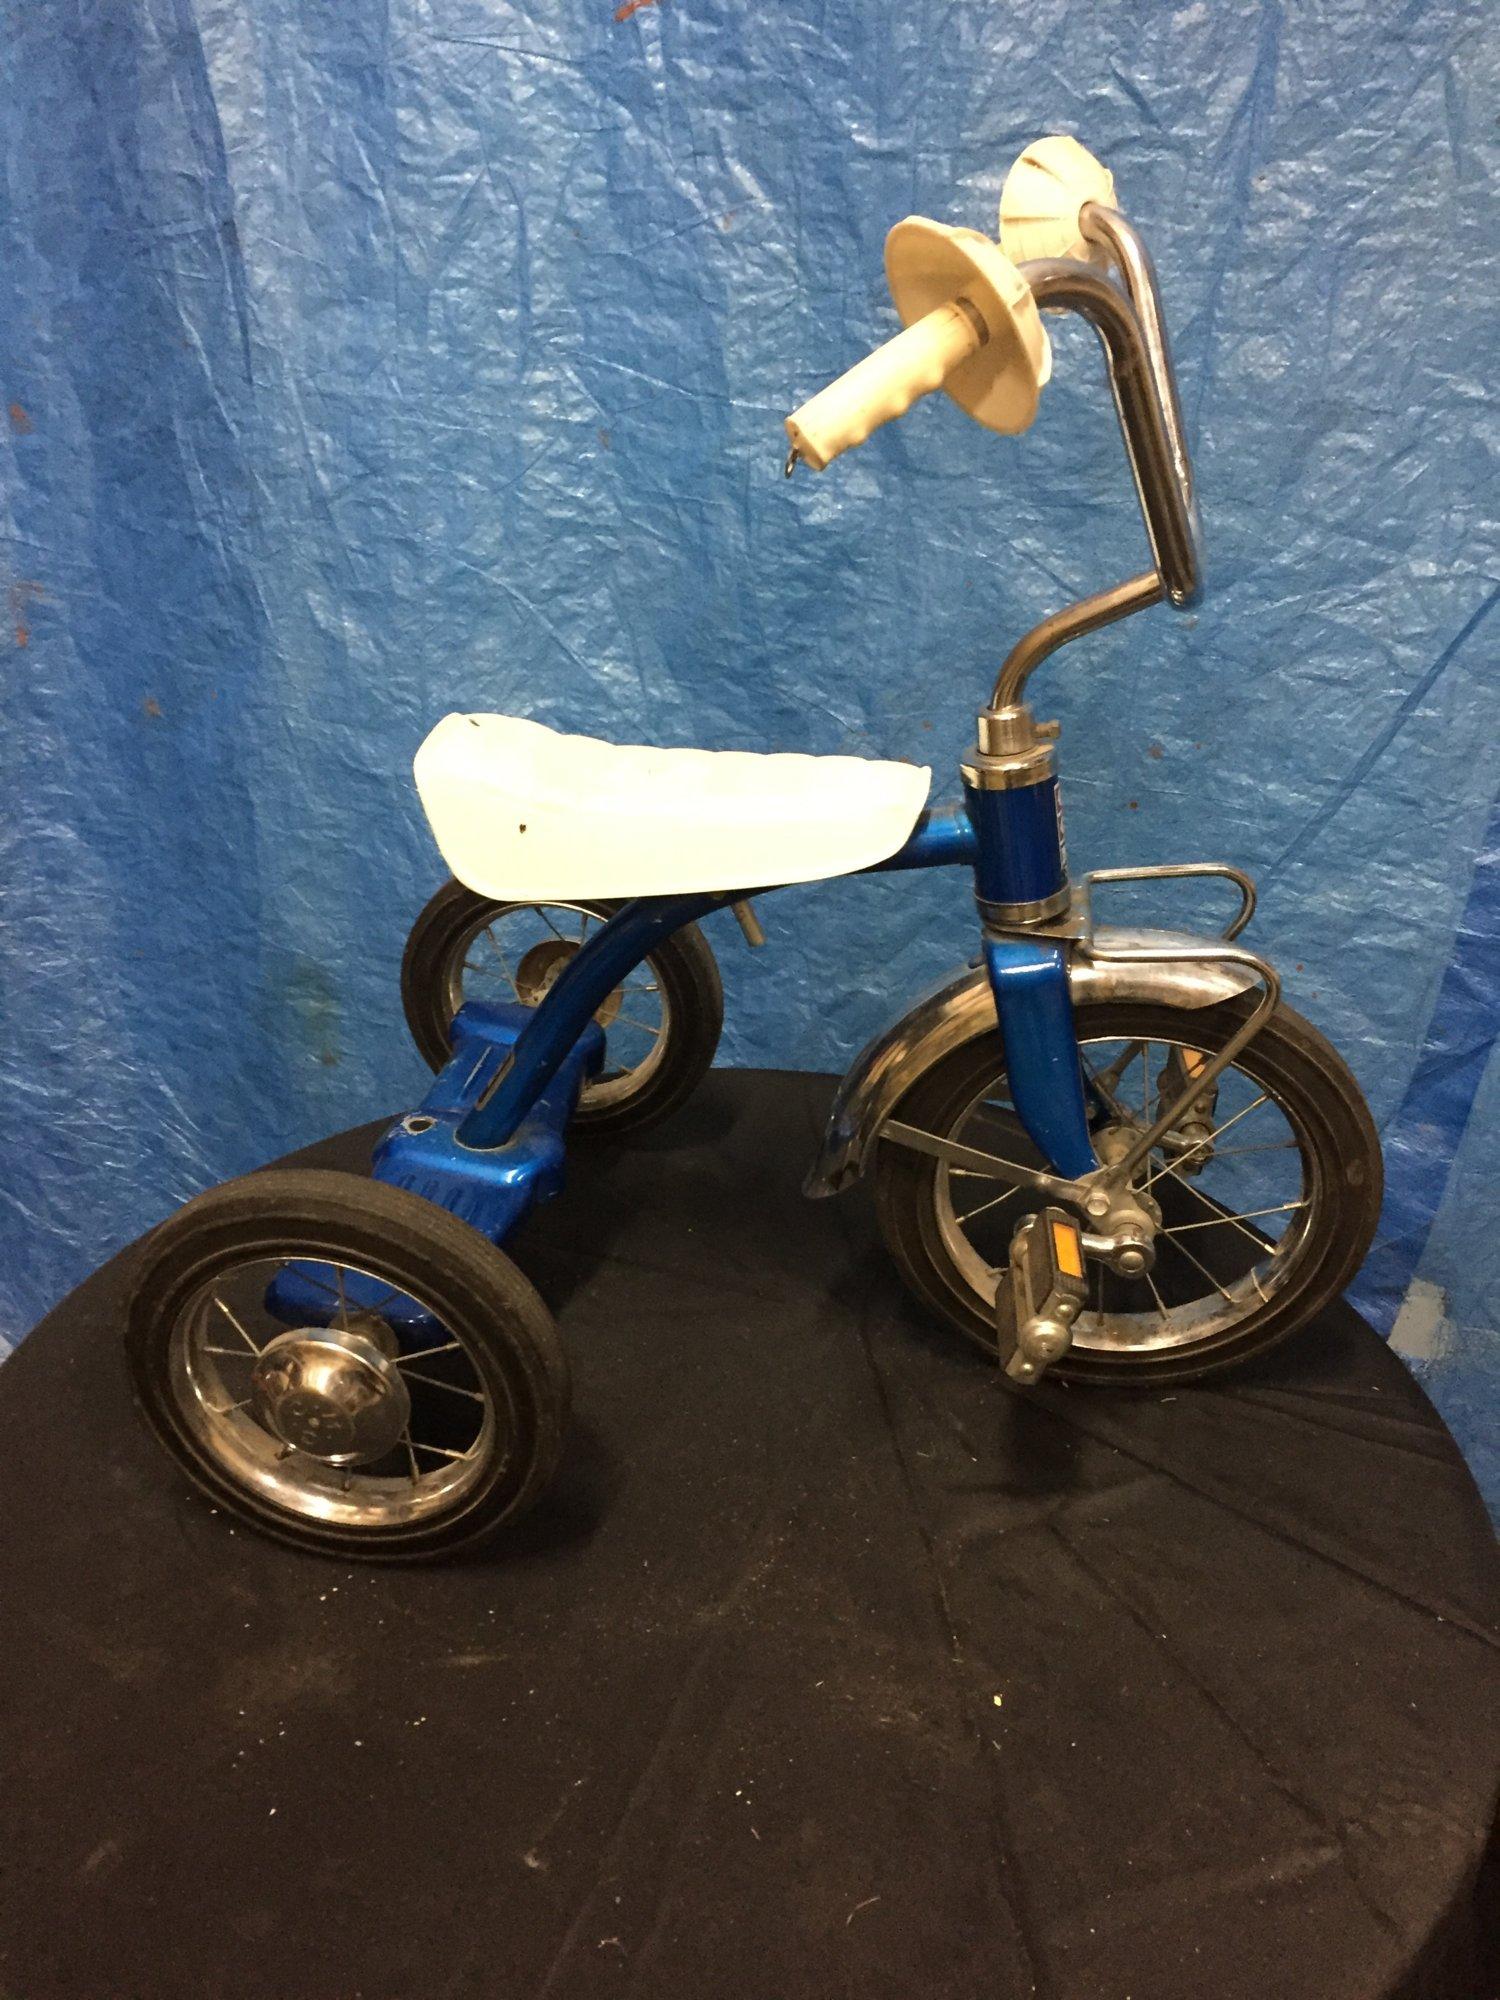 Vintage CCM 10%22 Trike Blue - $50.jpg